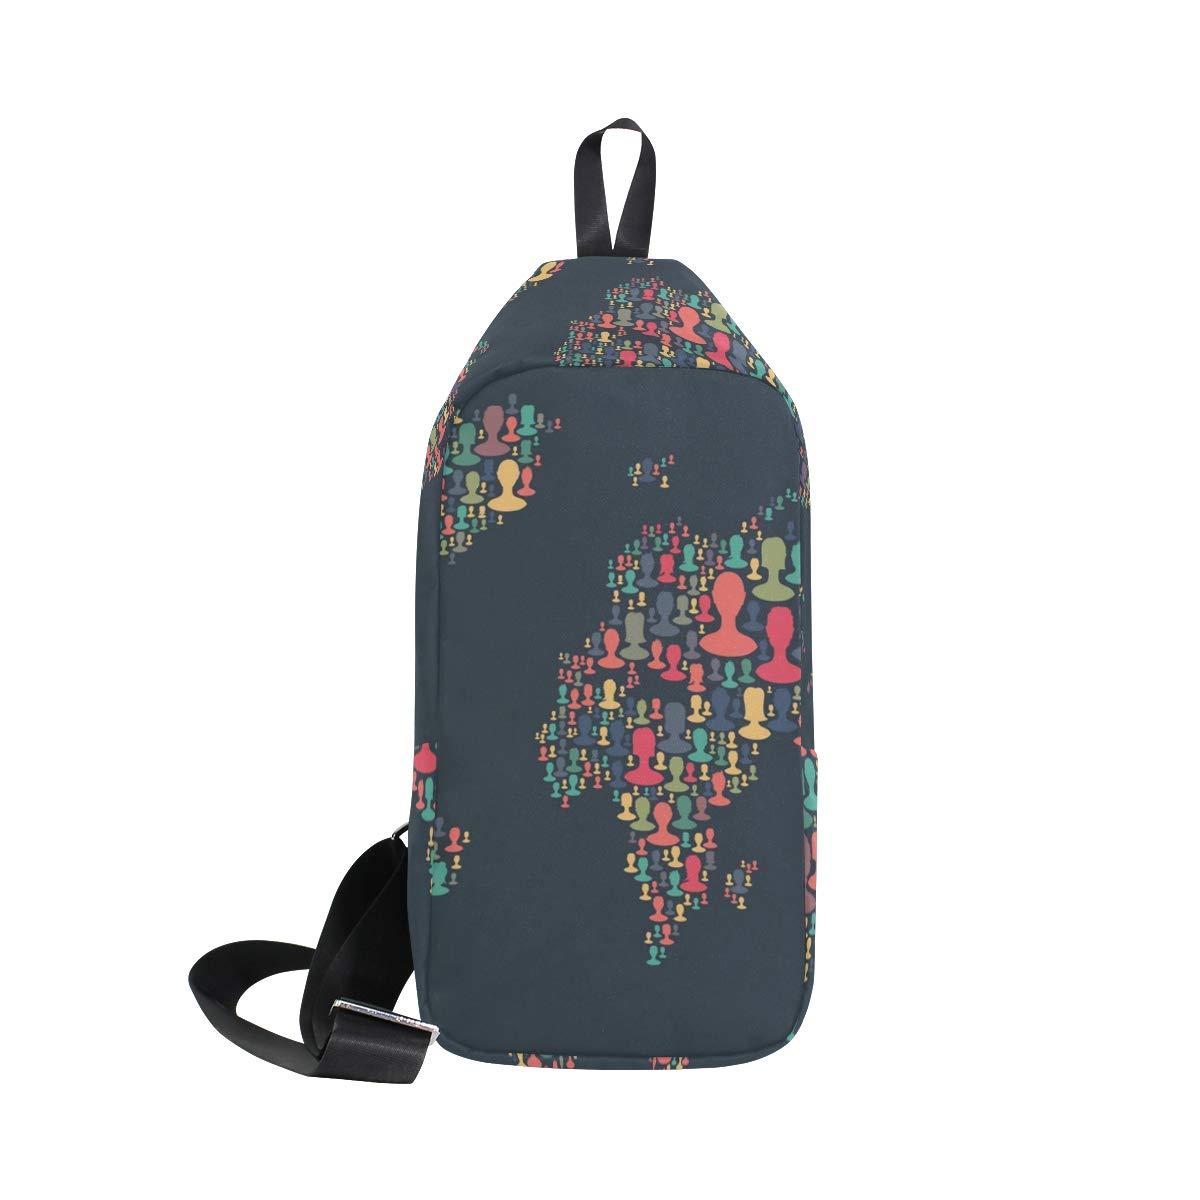 AHOMY World Map People Messenger Bag Small Travel School Sling Bag Crossbody Bag